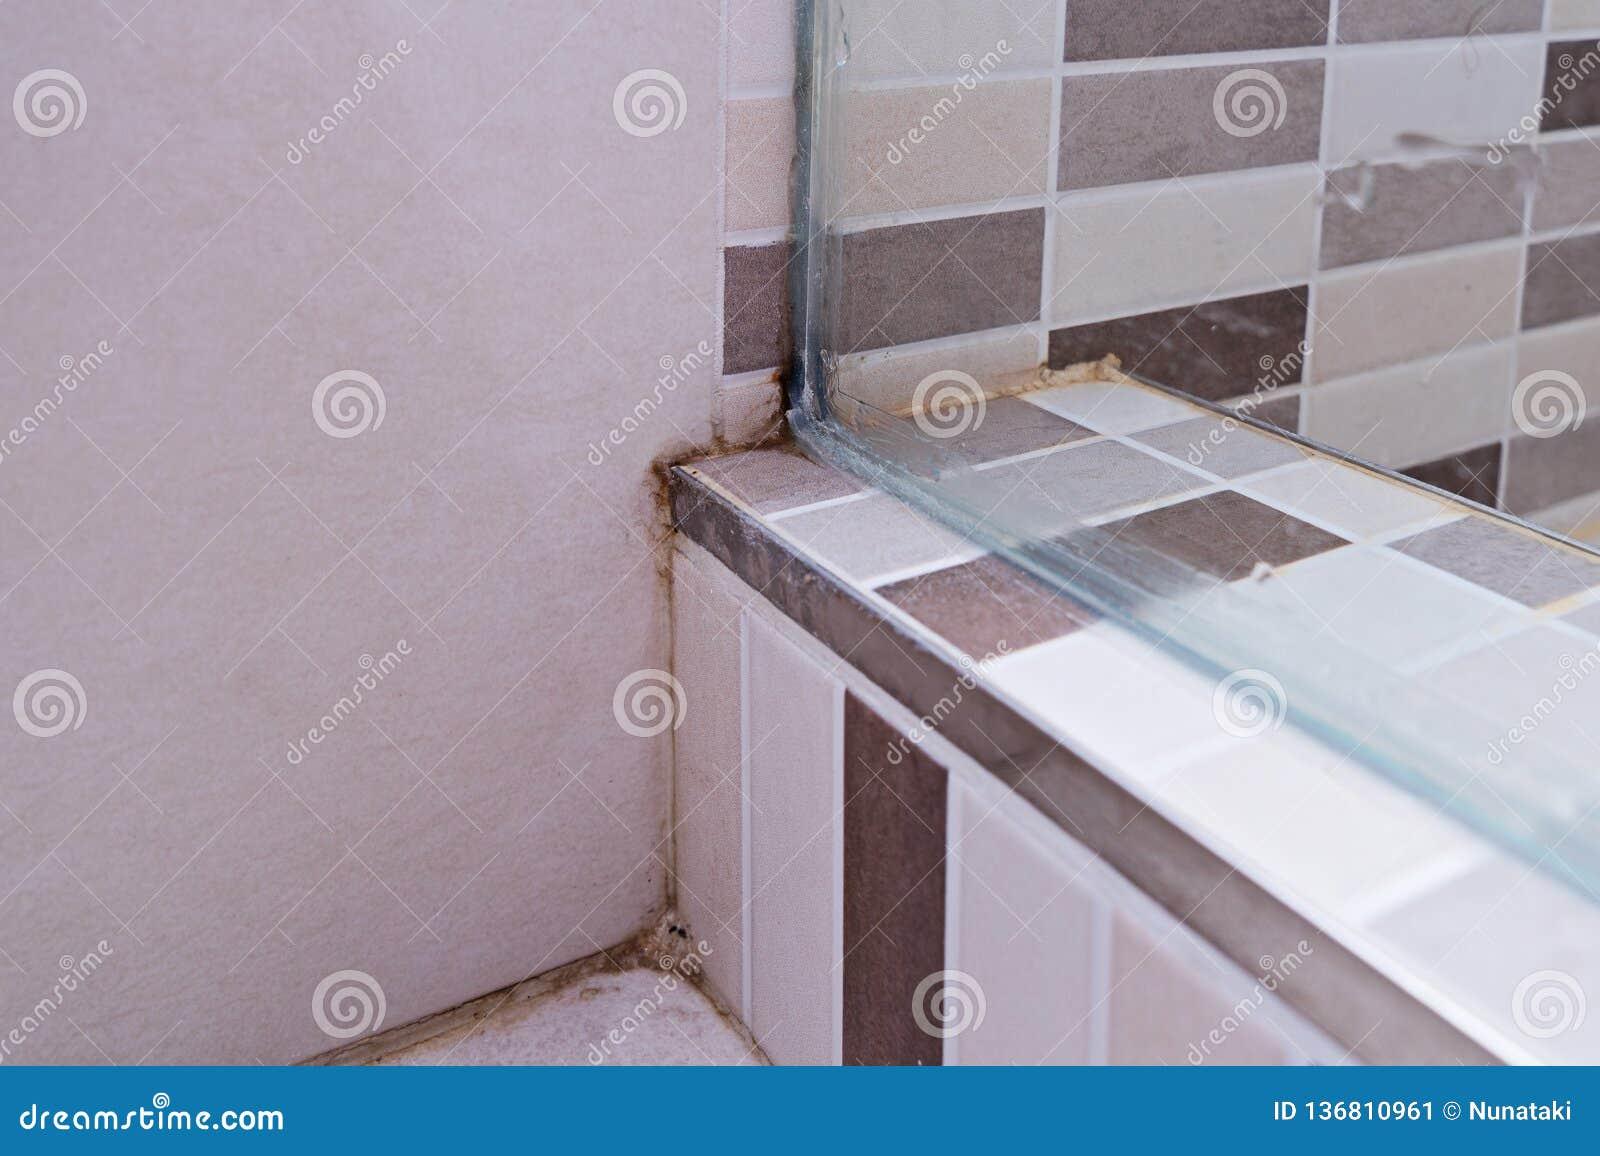 Unhygienic Dirty Mildew In Bathroom On Ceramic Floor Stock Image